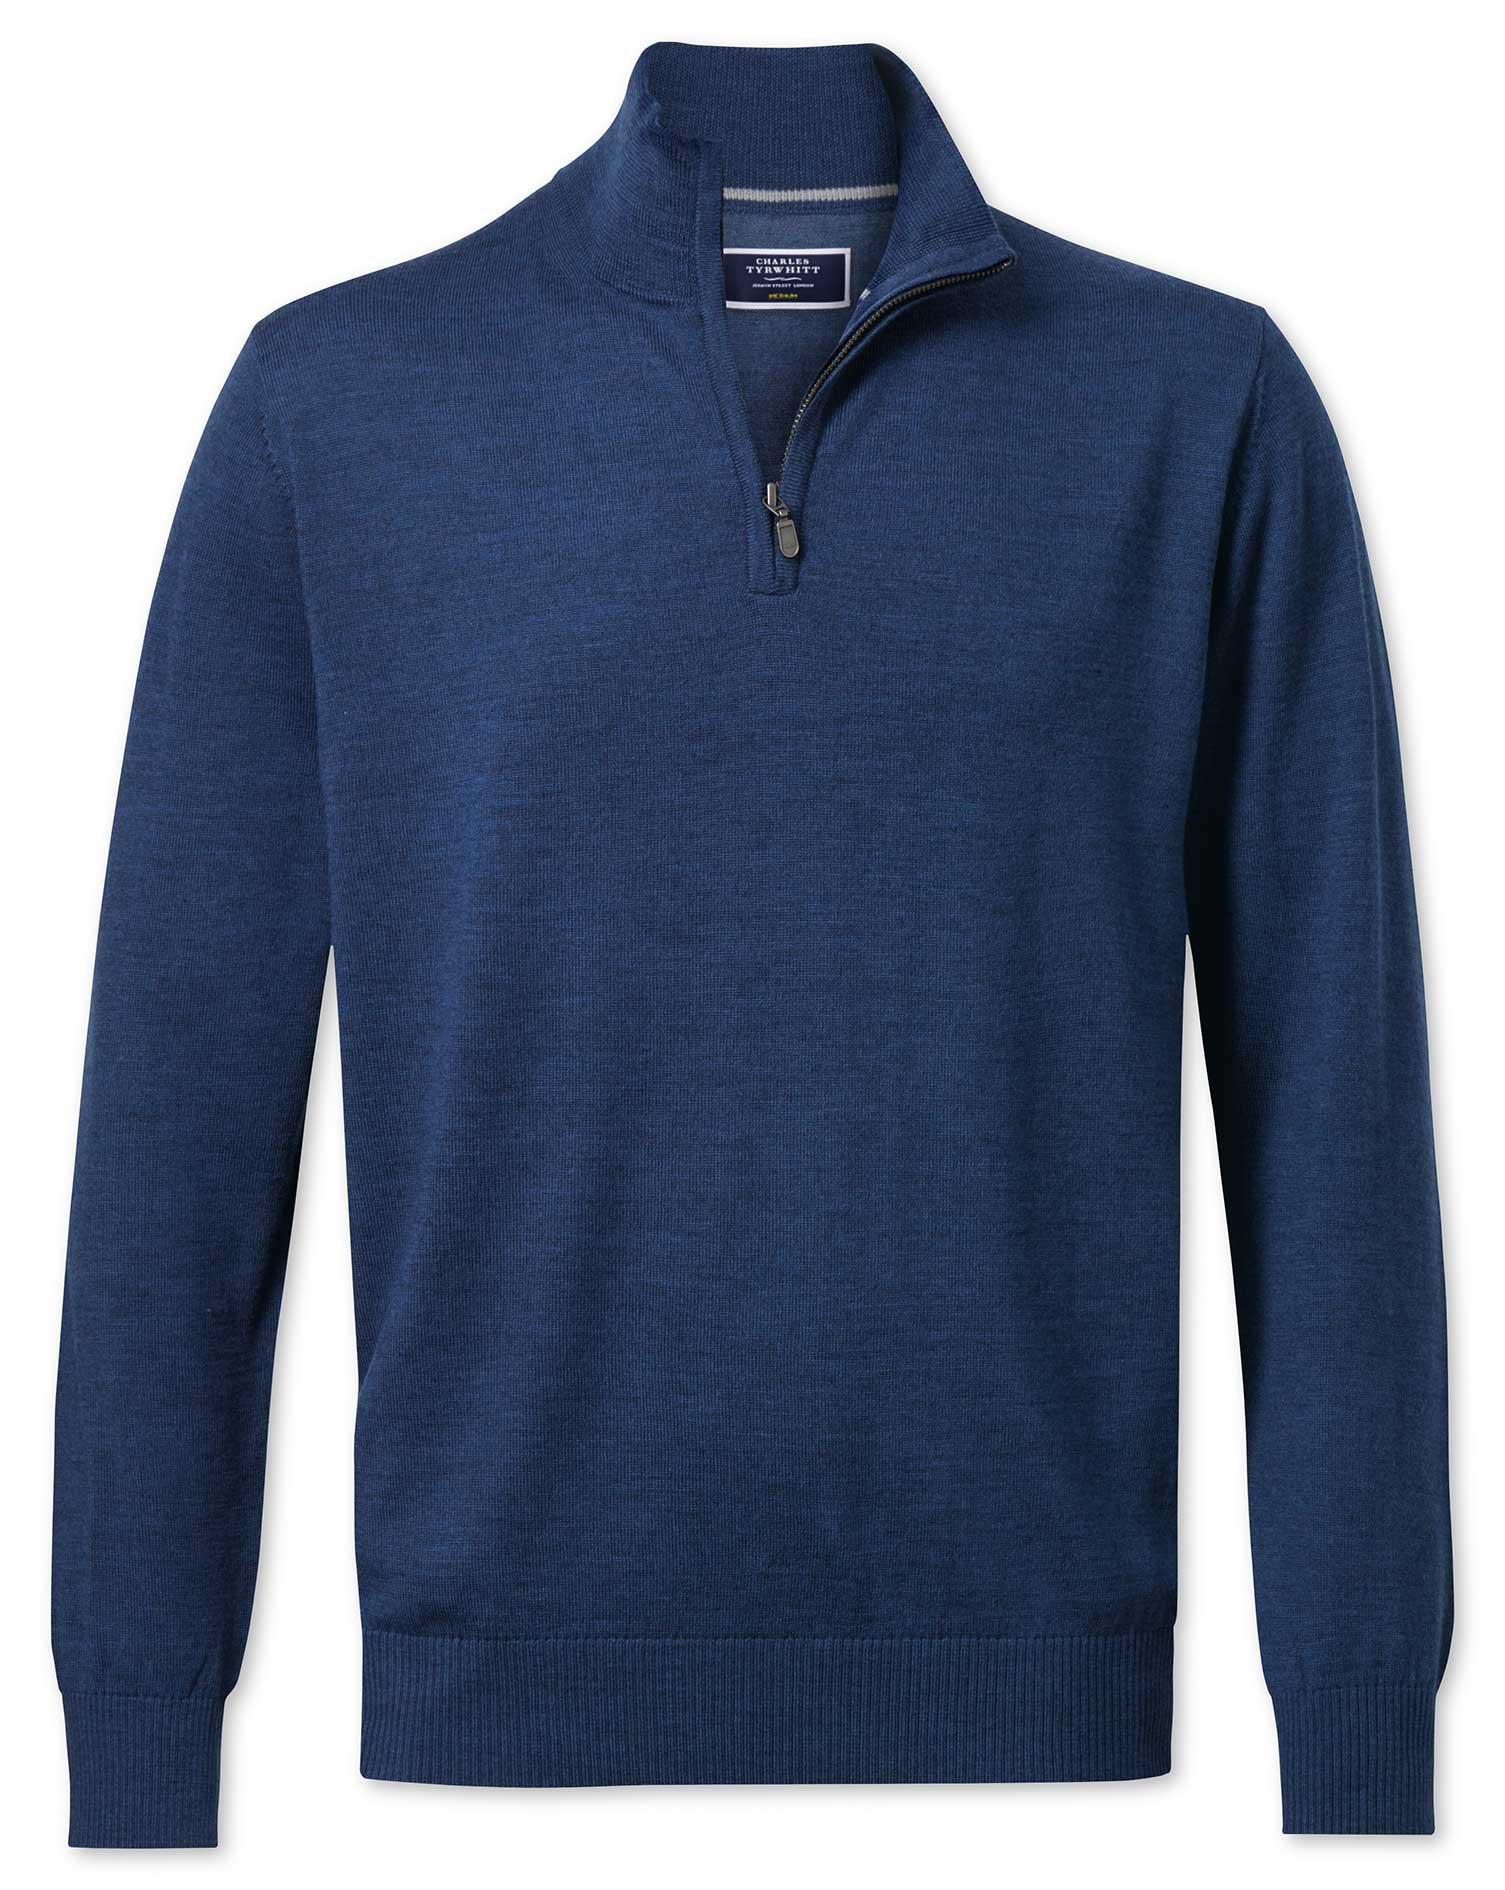 Mid Blue Merino Wool Zip Neck Jumper Size XXL by Charles Tyrwhitt